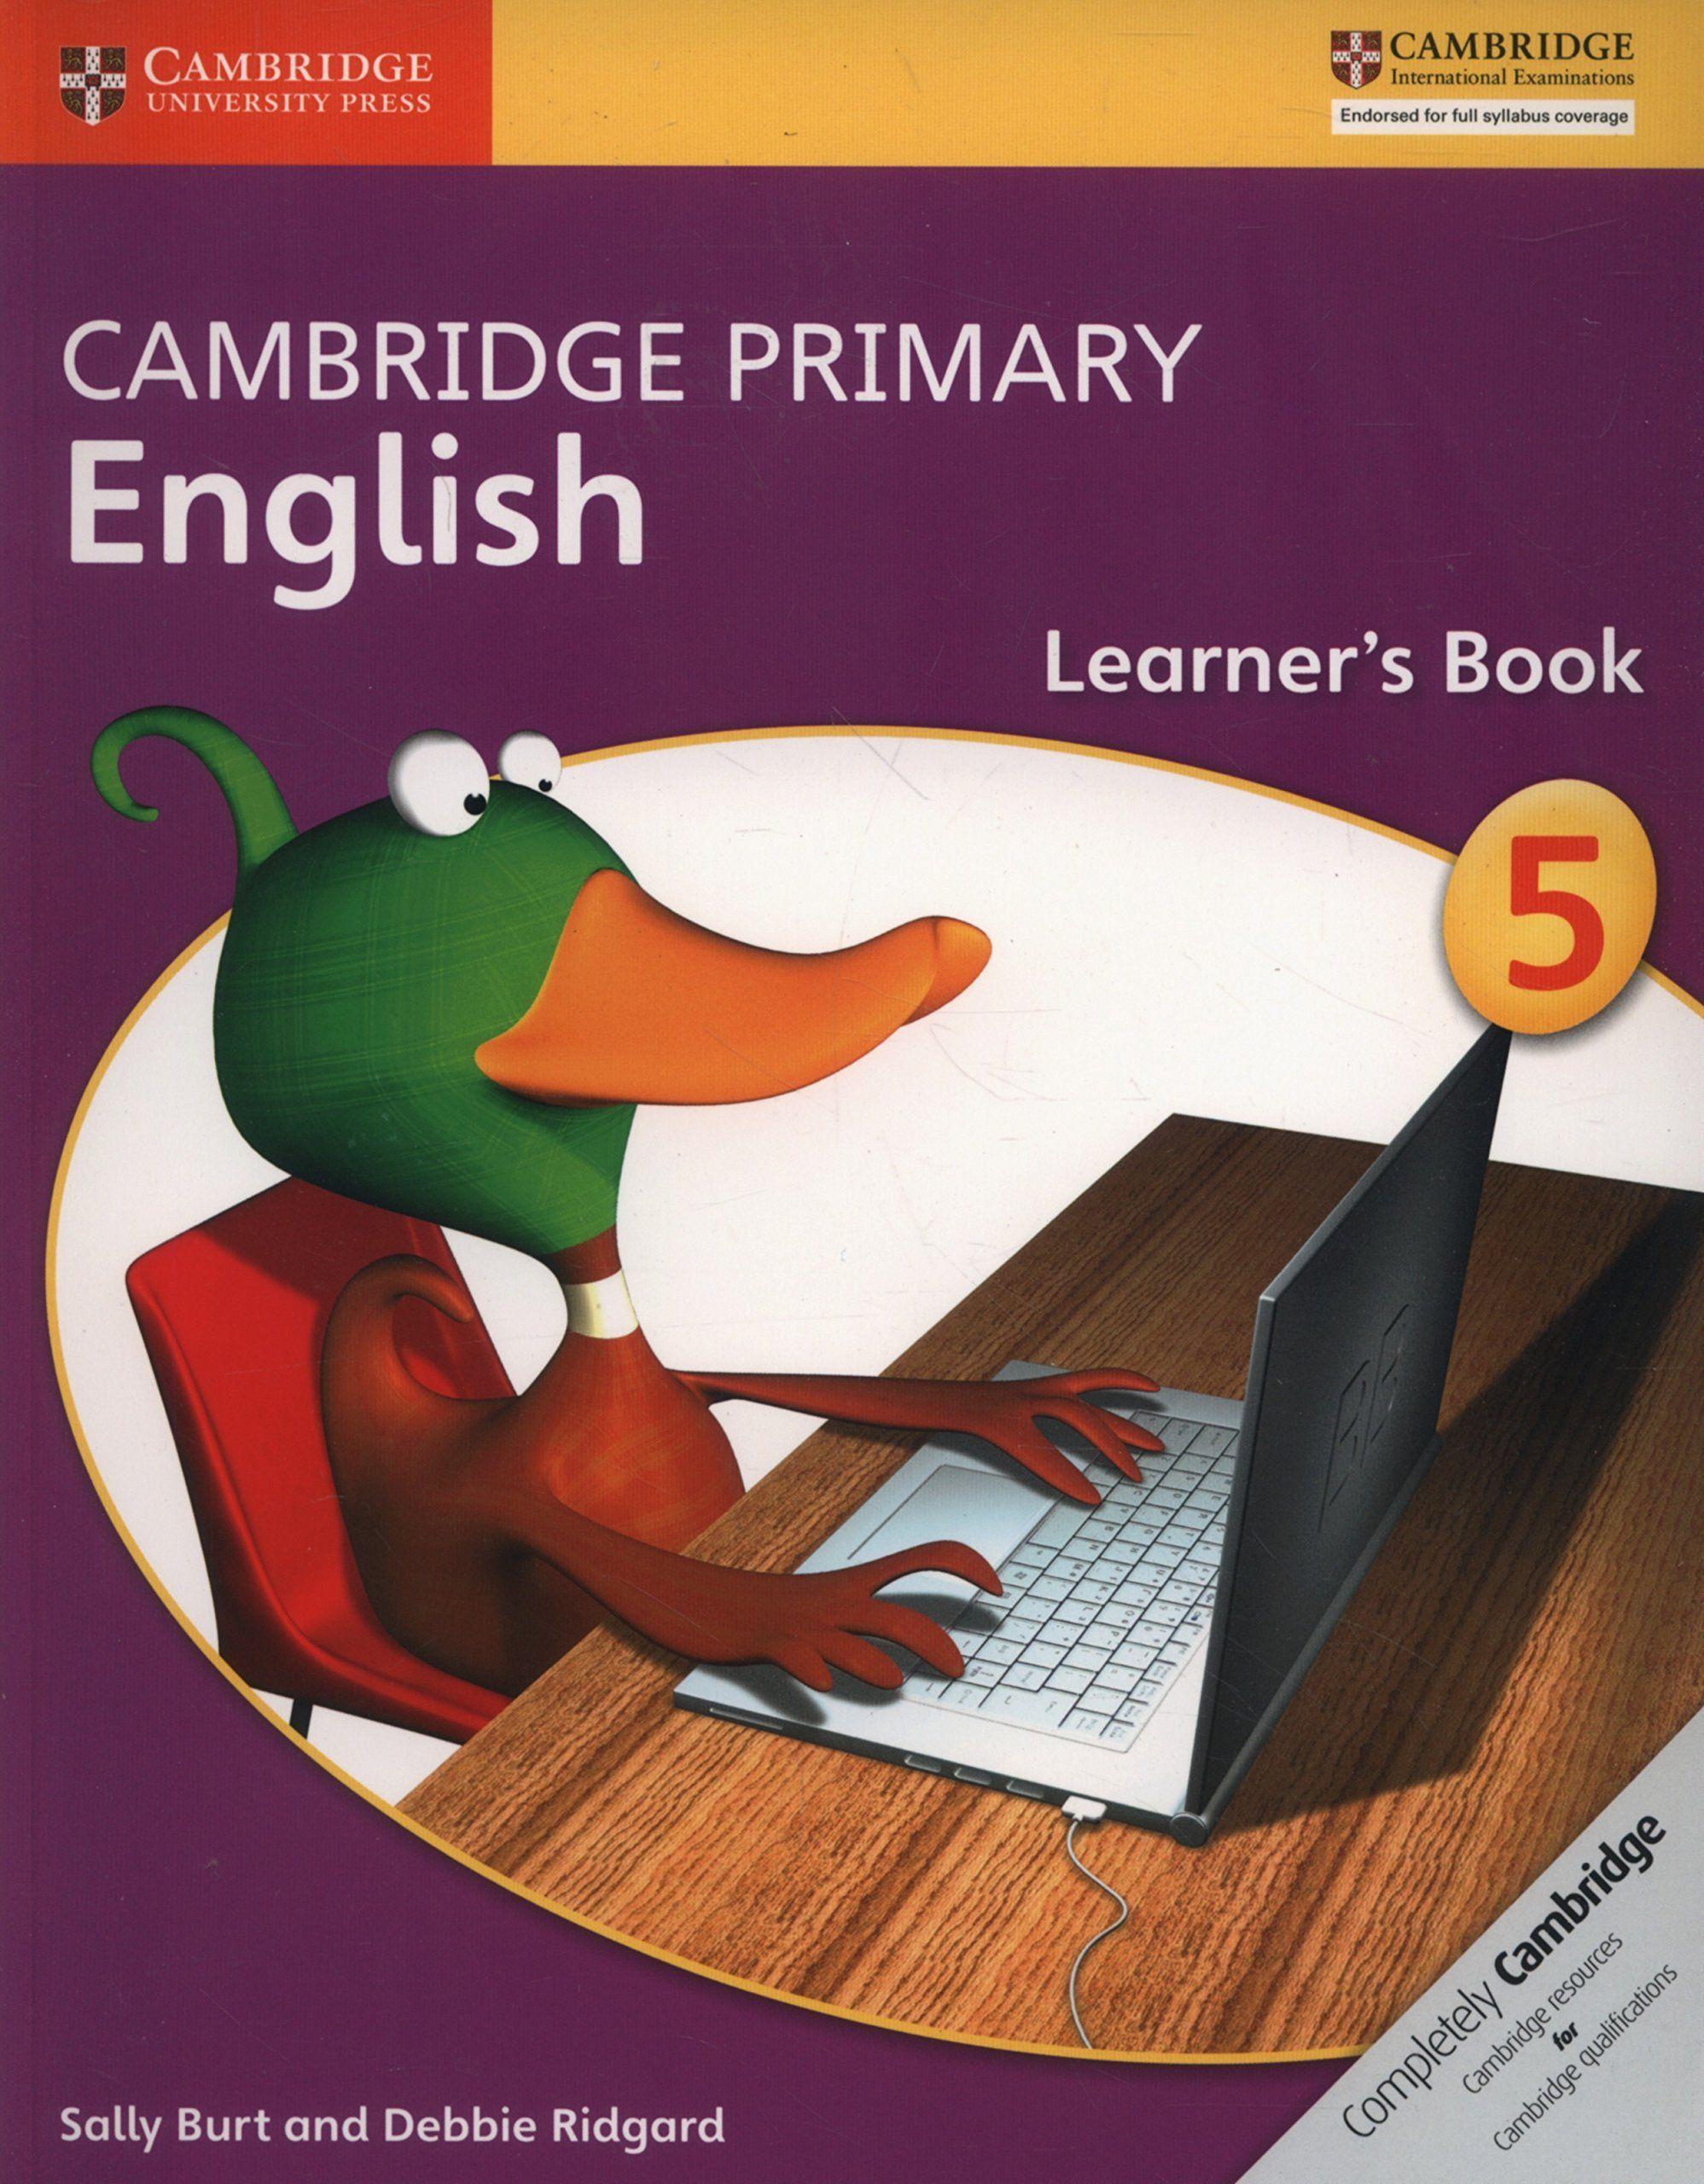 Picture of Cambridge Primary English: Cambridge Primary English Stage 5 Learner's Book